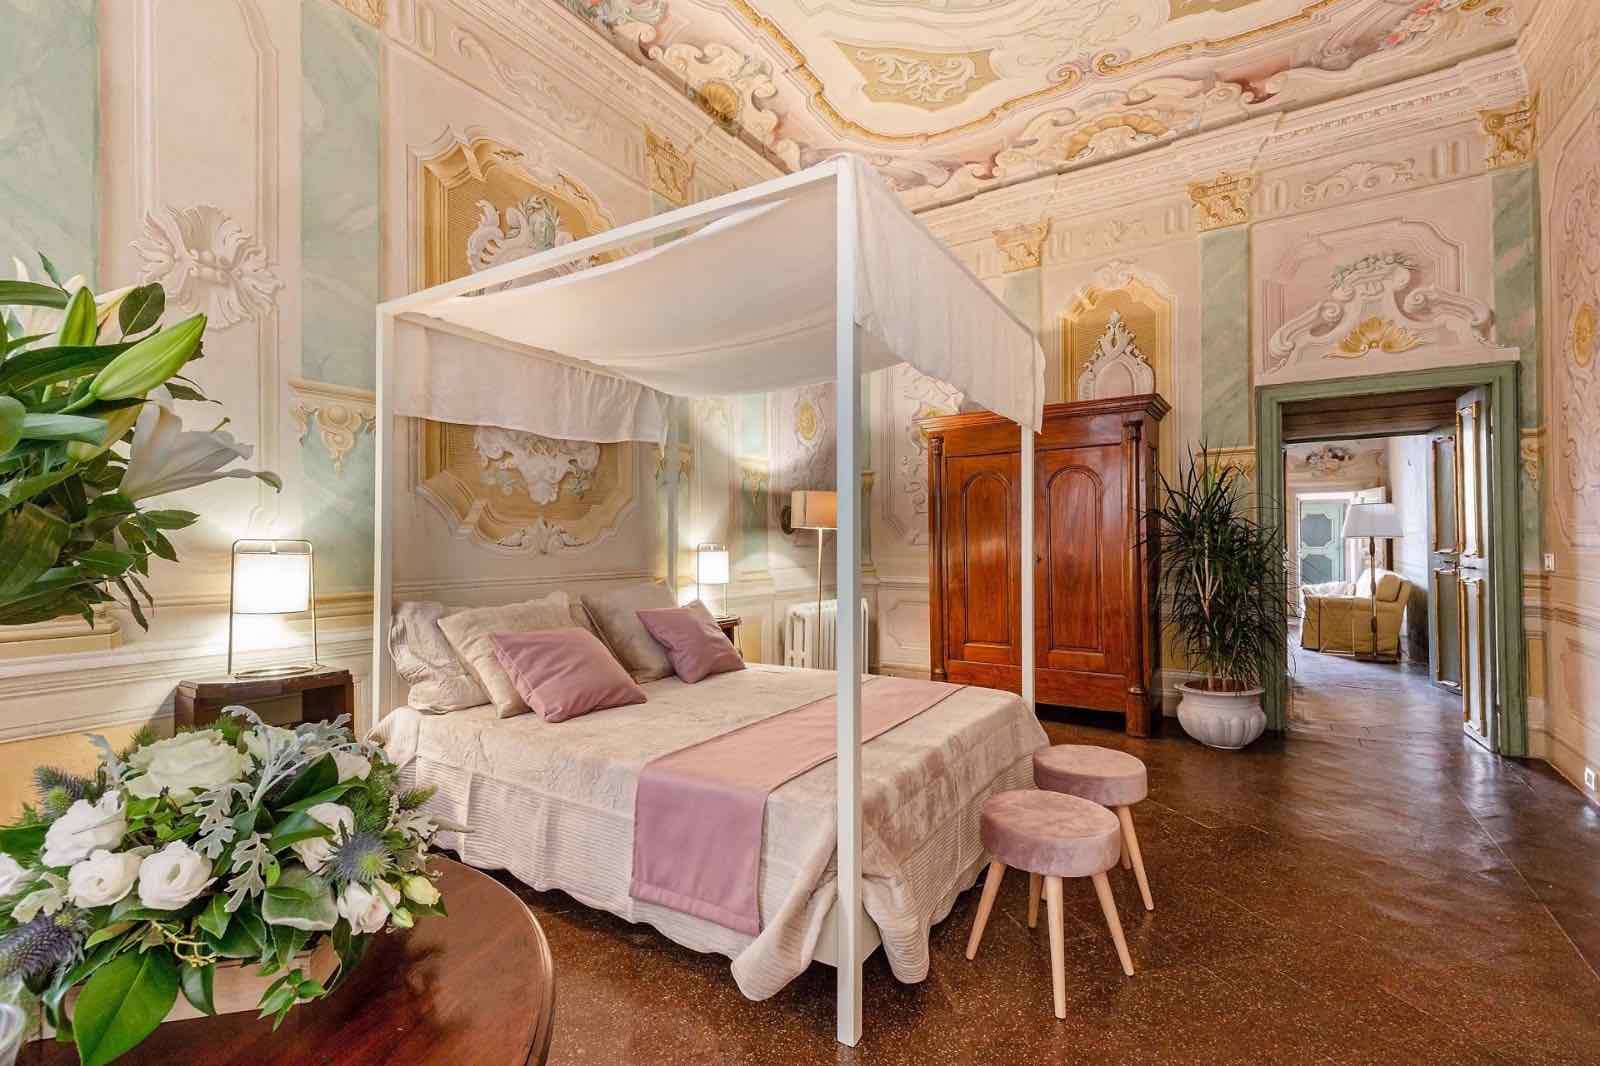 residenza san paolino al 112 lucca